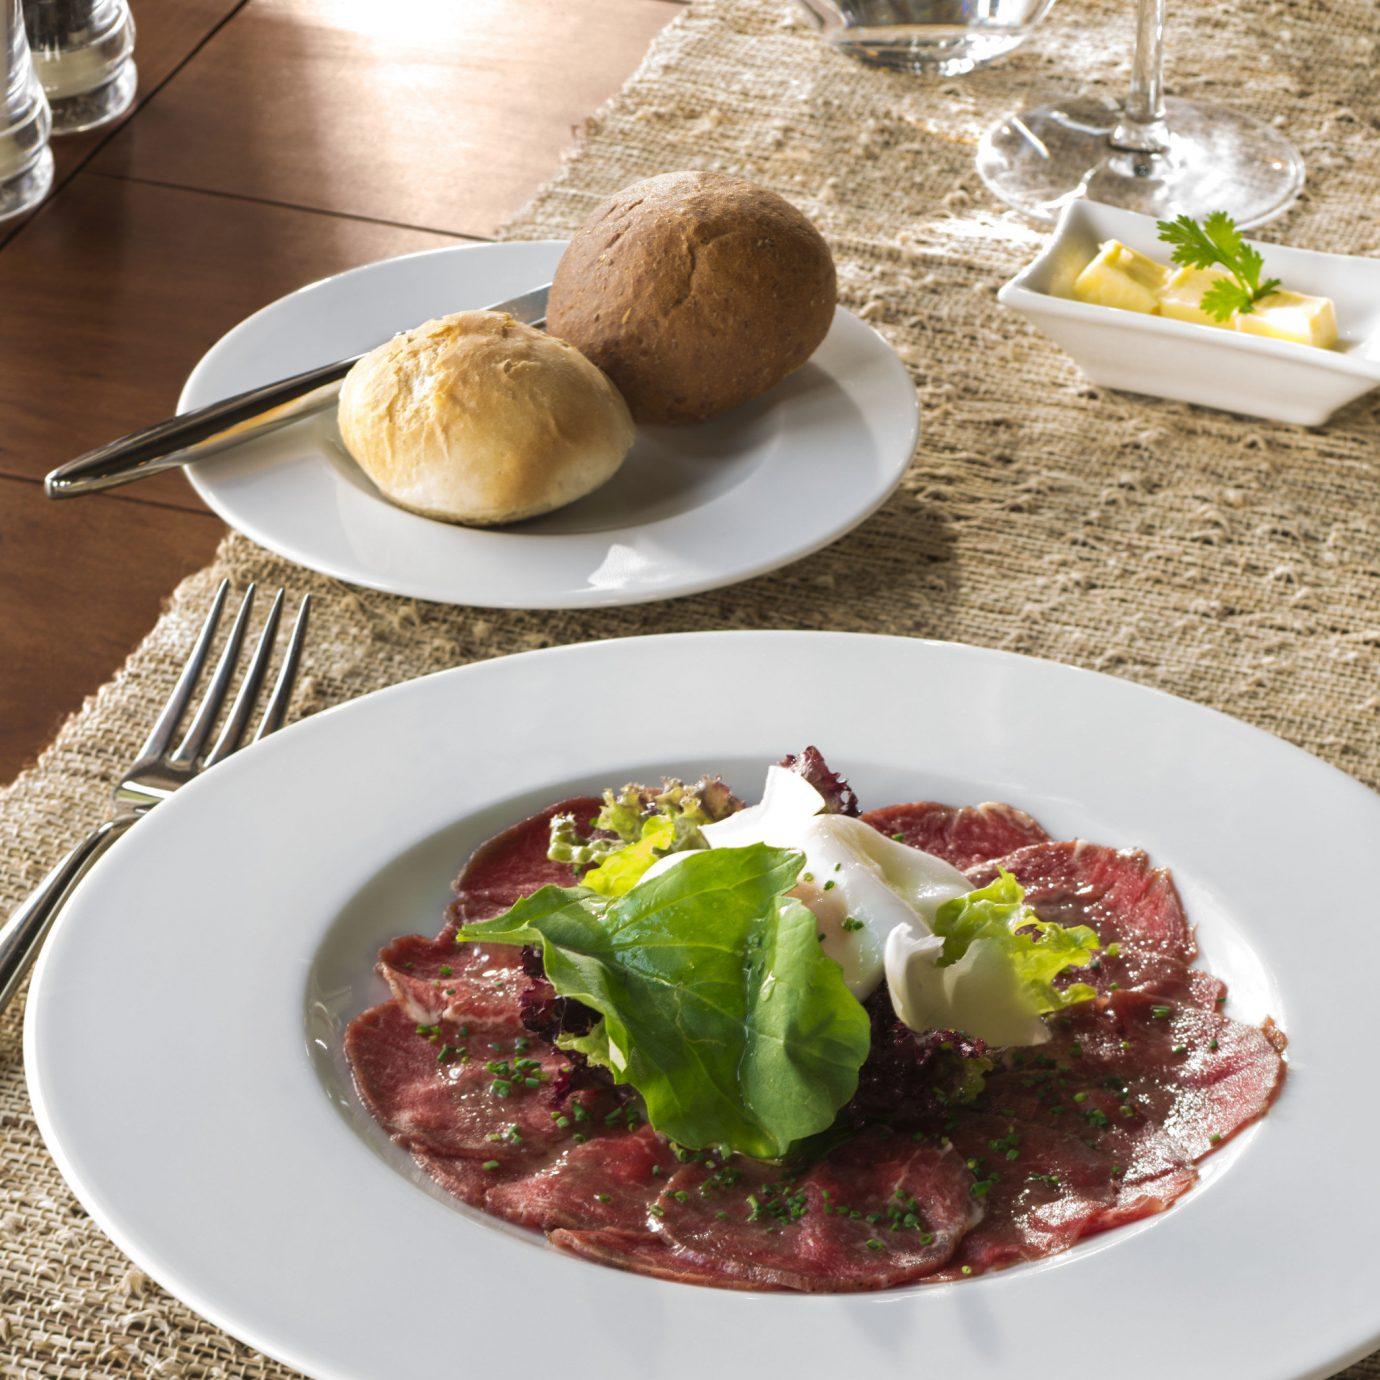 plate food meat breakfast brunch lunch restaurant cuisine vegetable cooking dinner